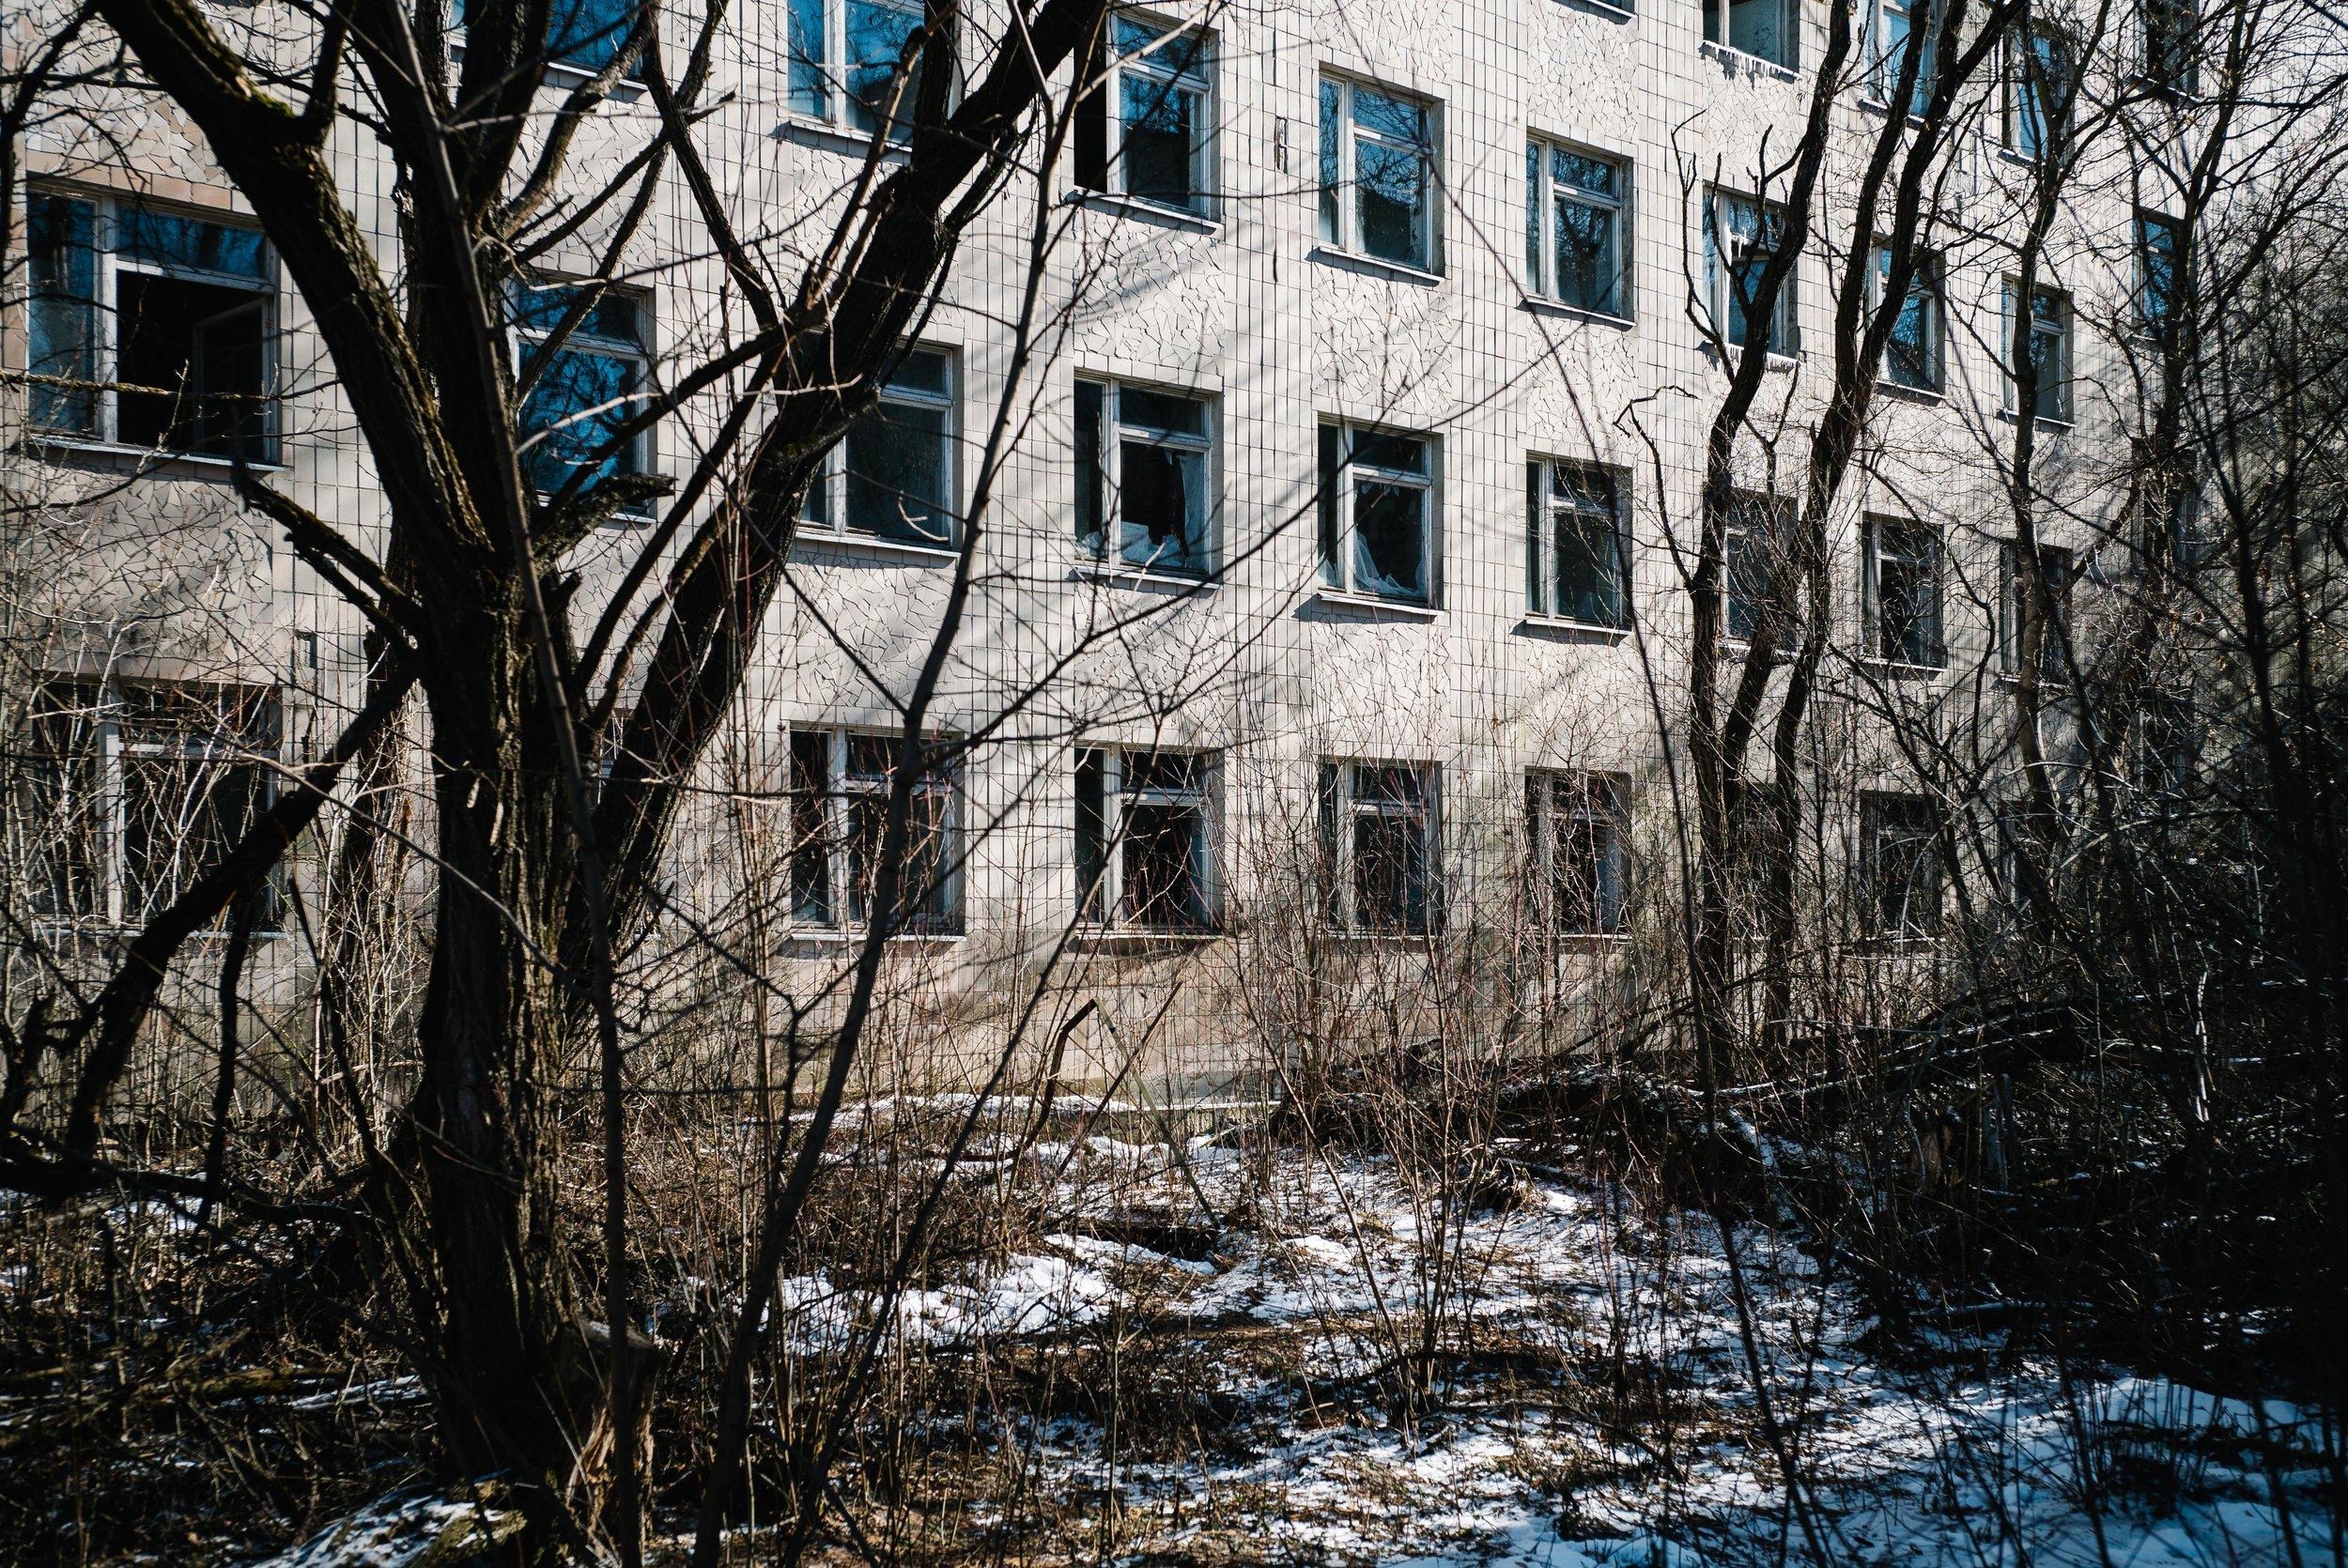 Pripyat Hospital МСЧ-126 - Clifford Darby 2019